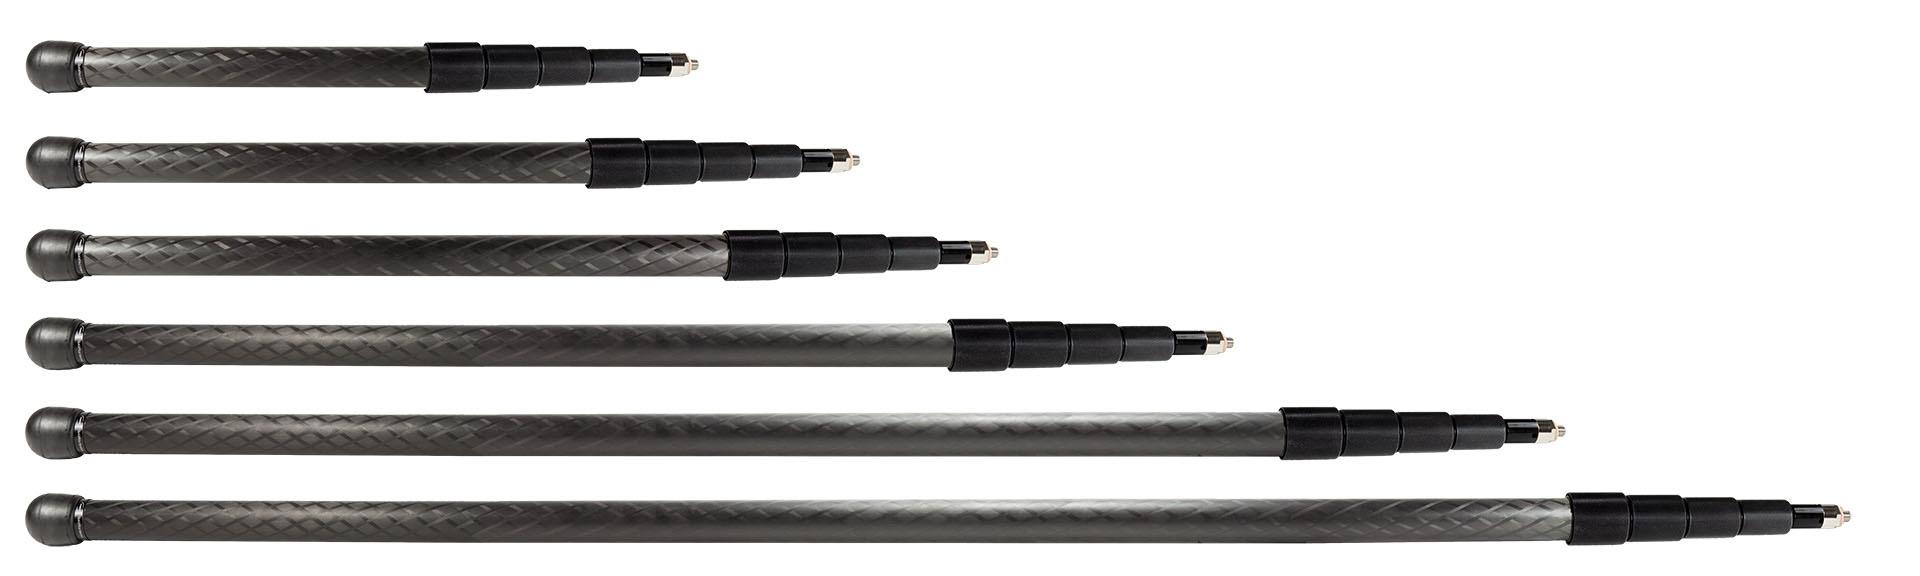 Ambient Ambient - QP580 Series 5 - 81 - 310 cm